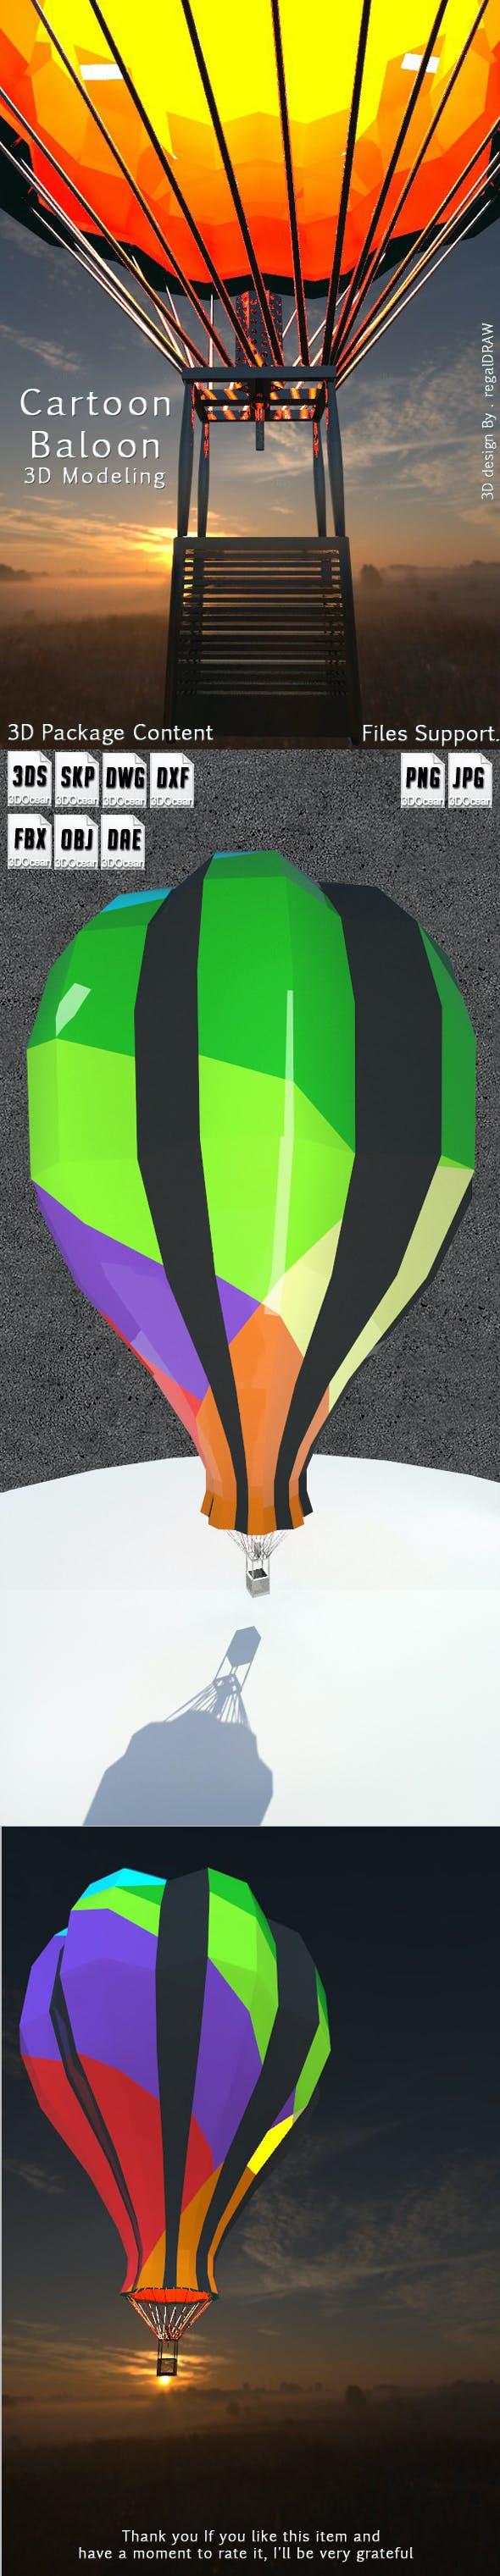 Cartoon Balloon_3D Modeling - 3DOcean Item for Sale